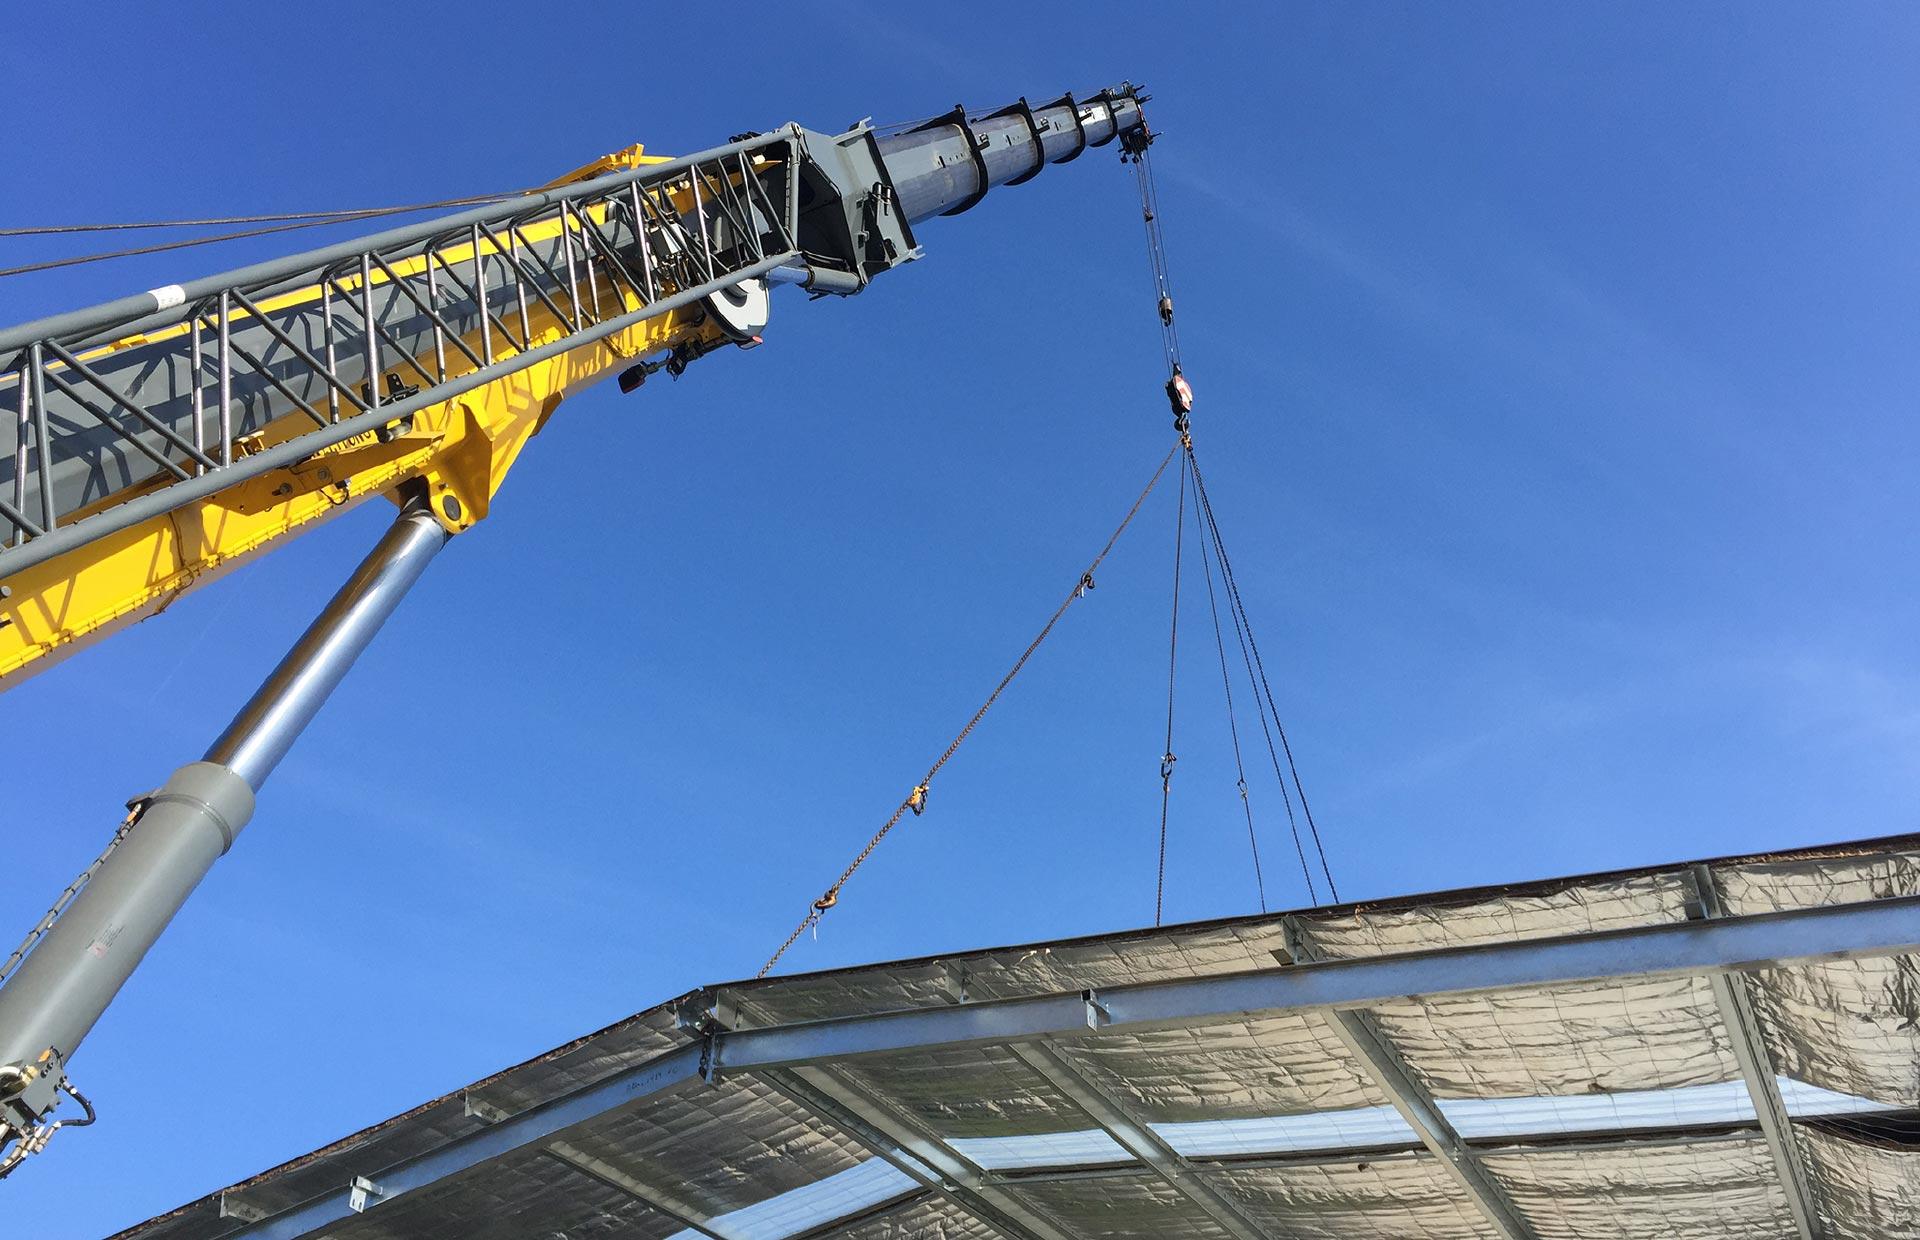 Colac Crane Hire Services - Colac Mobile Crane Hire